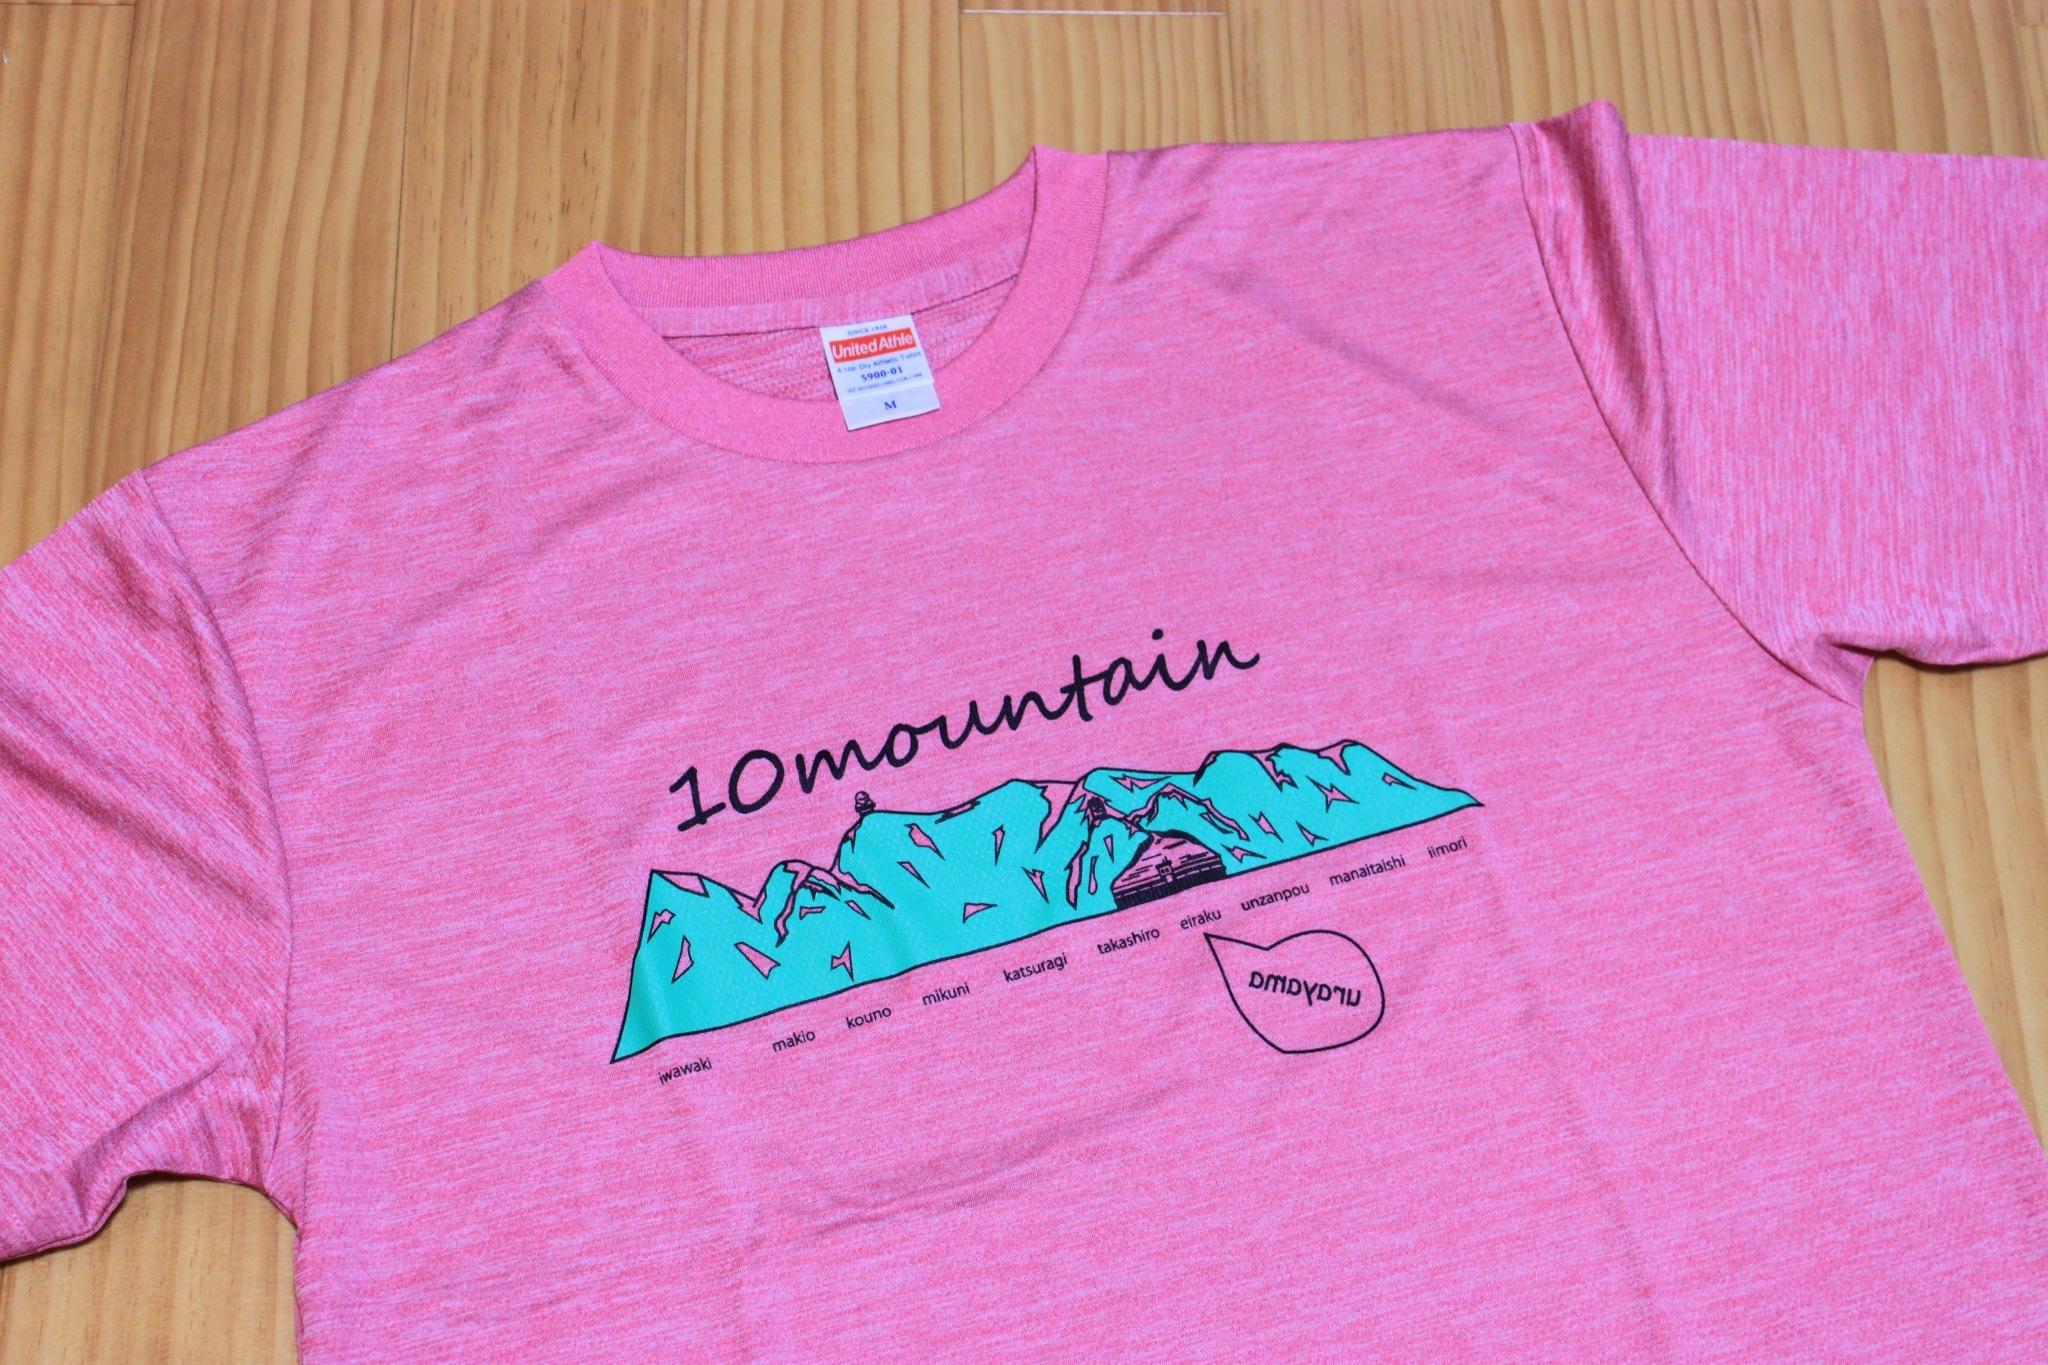 My 10Mountain / sports pink